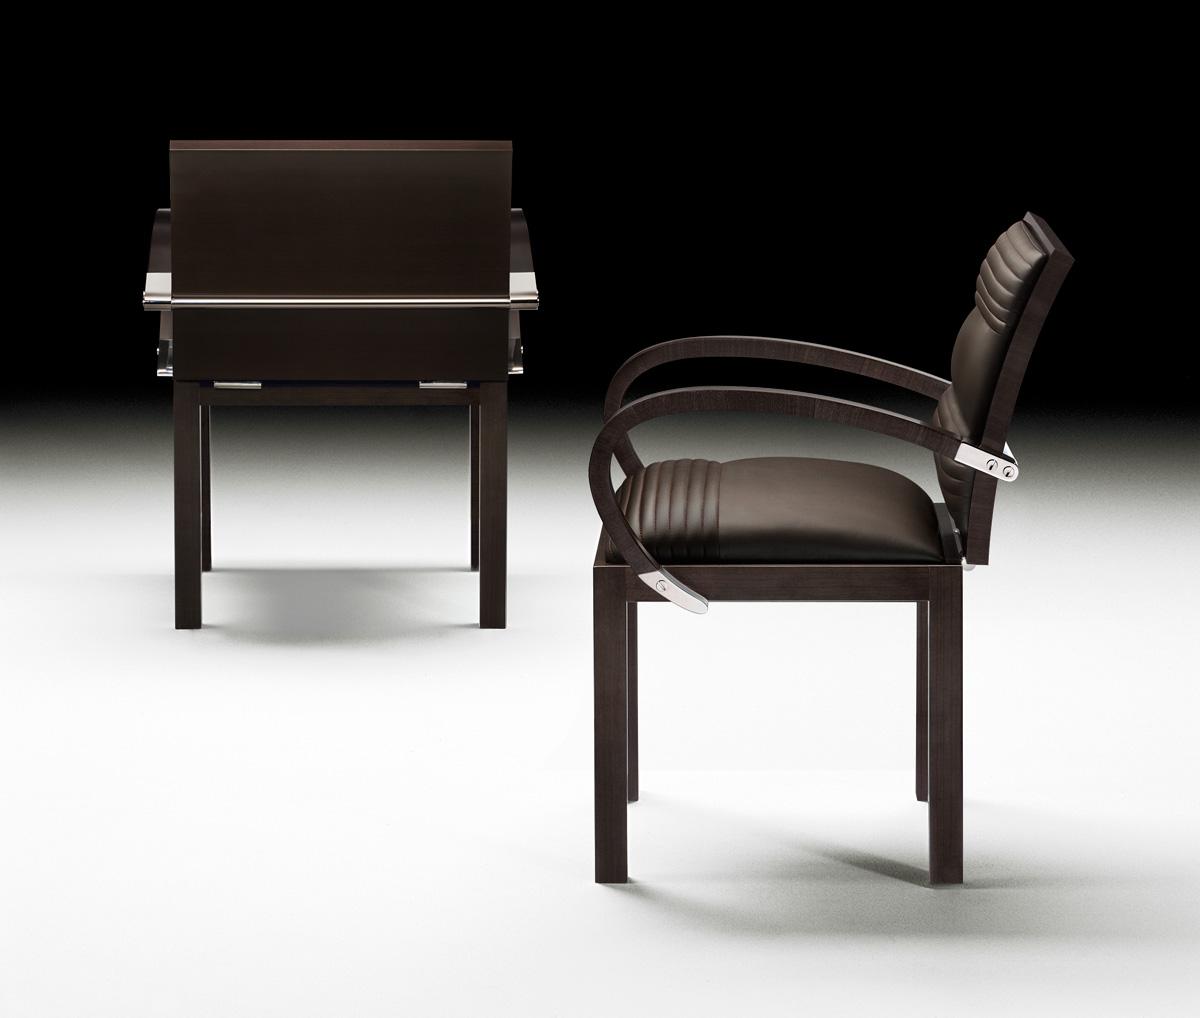 Awe Inspiring Casablanca Tresserra Caraccident5 Cool Chair Designs And Ideas Caraccident5Info